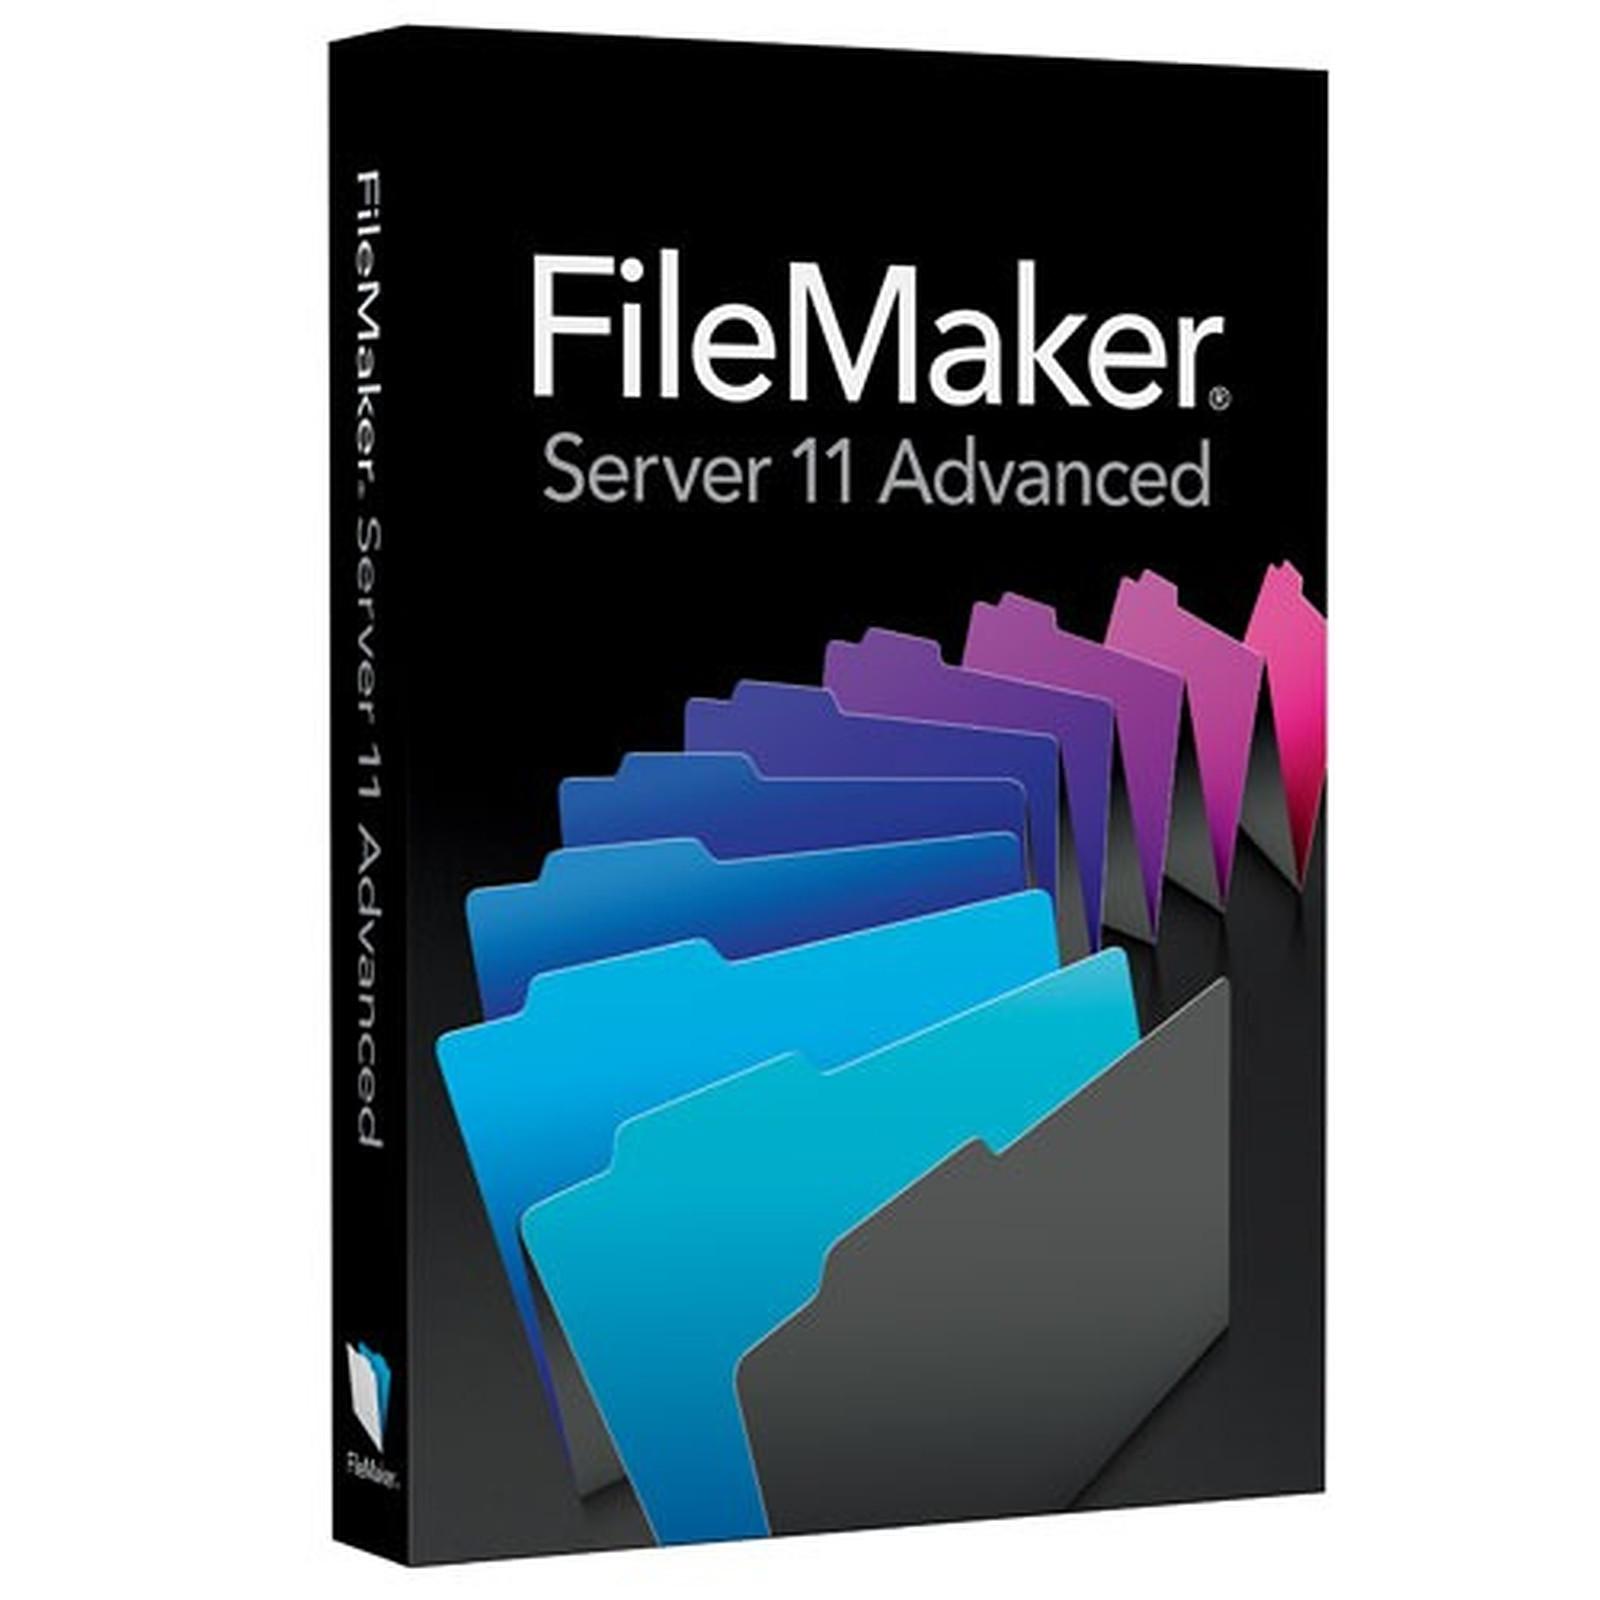 Filemaker Server 11 Advanced - Licence Education